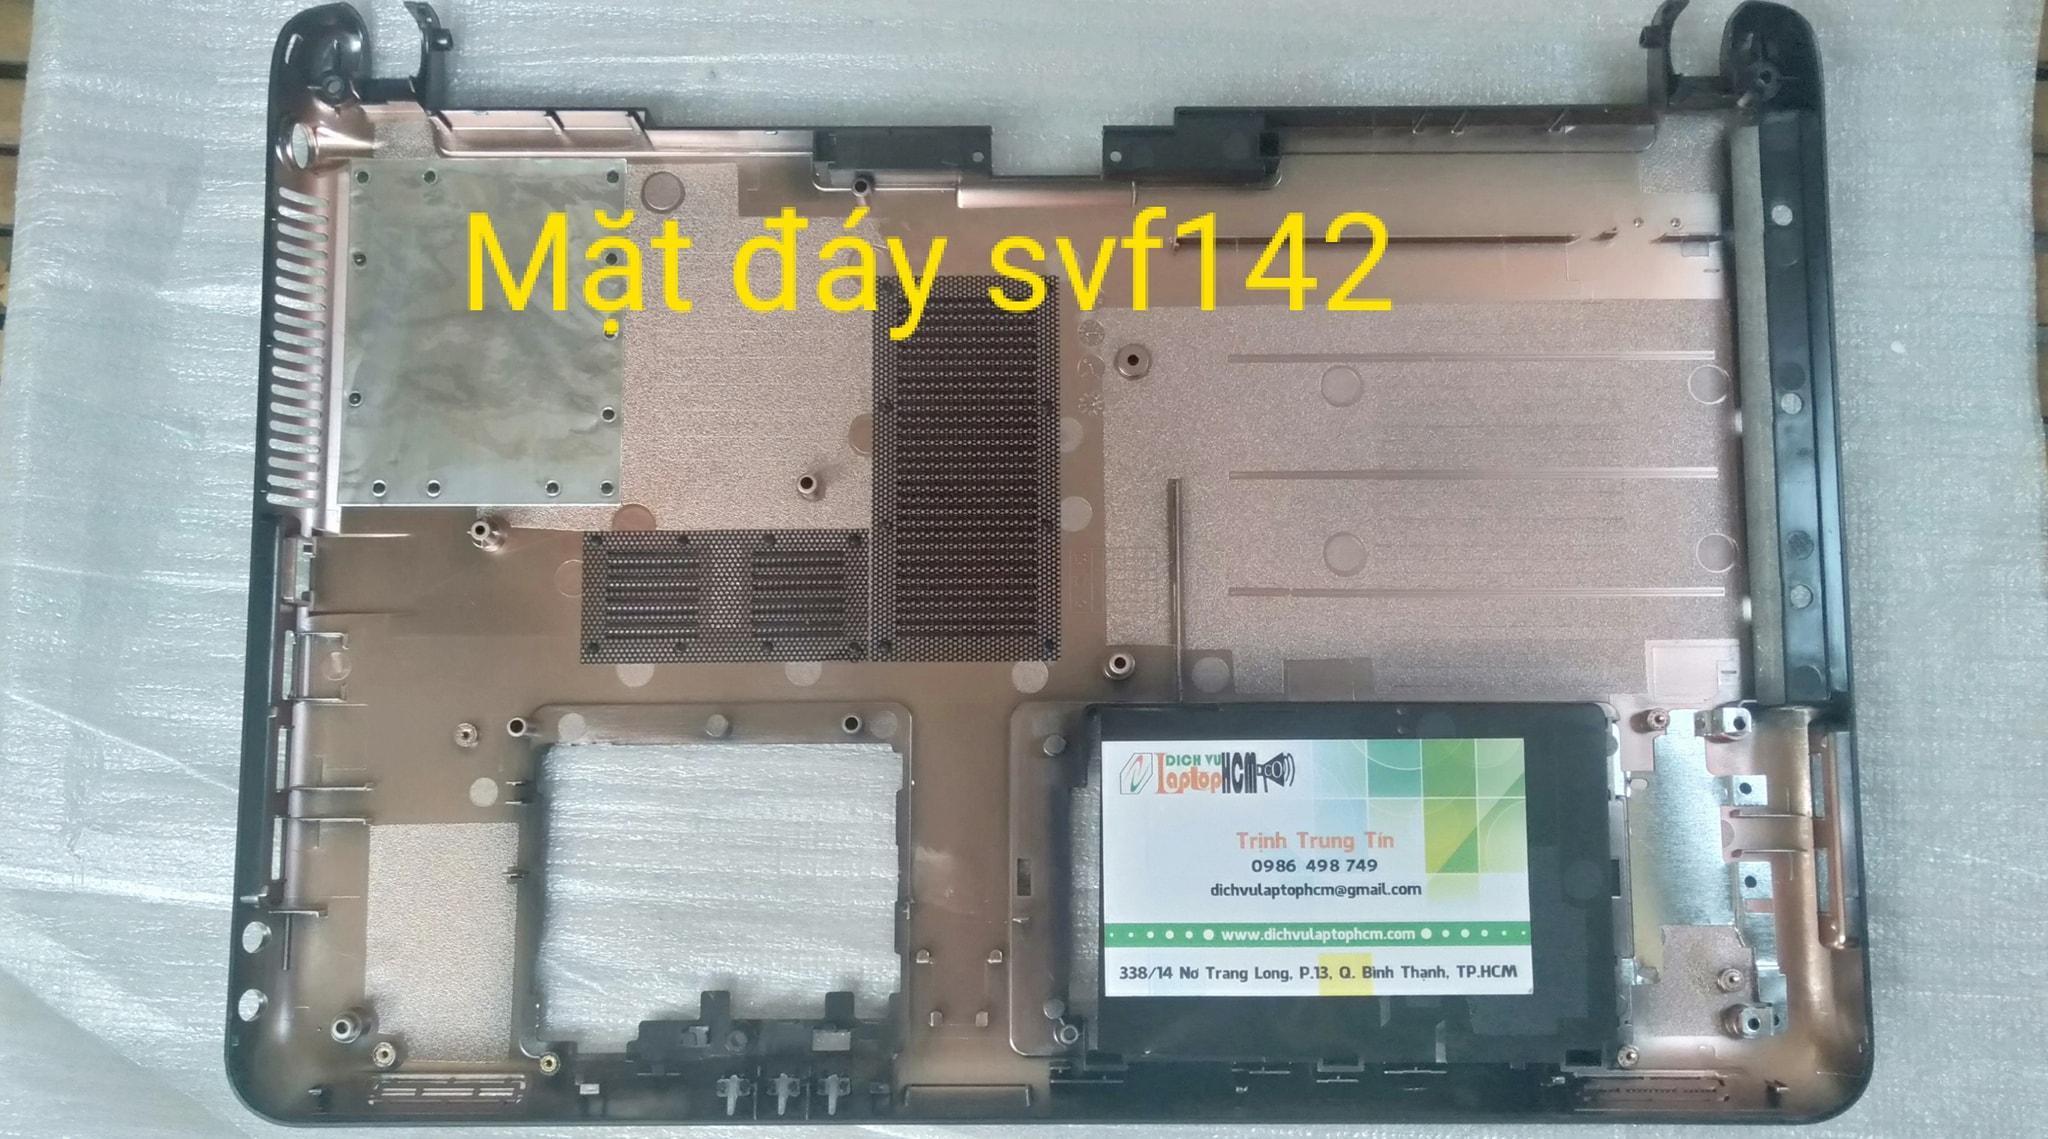 Vo-Laptop-Sony-SVF142-Vaio-Mat-Day-Mat-D